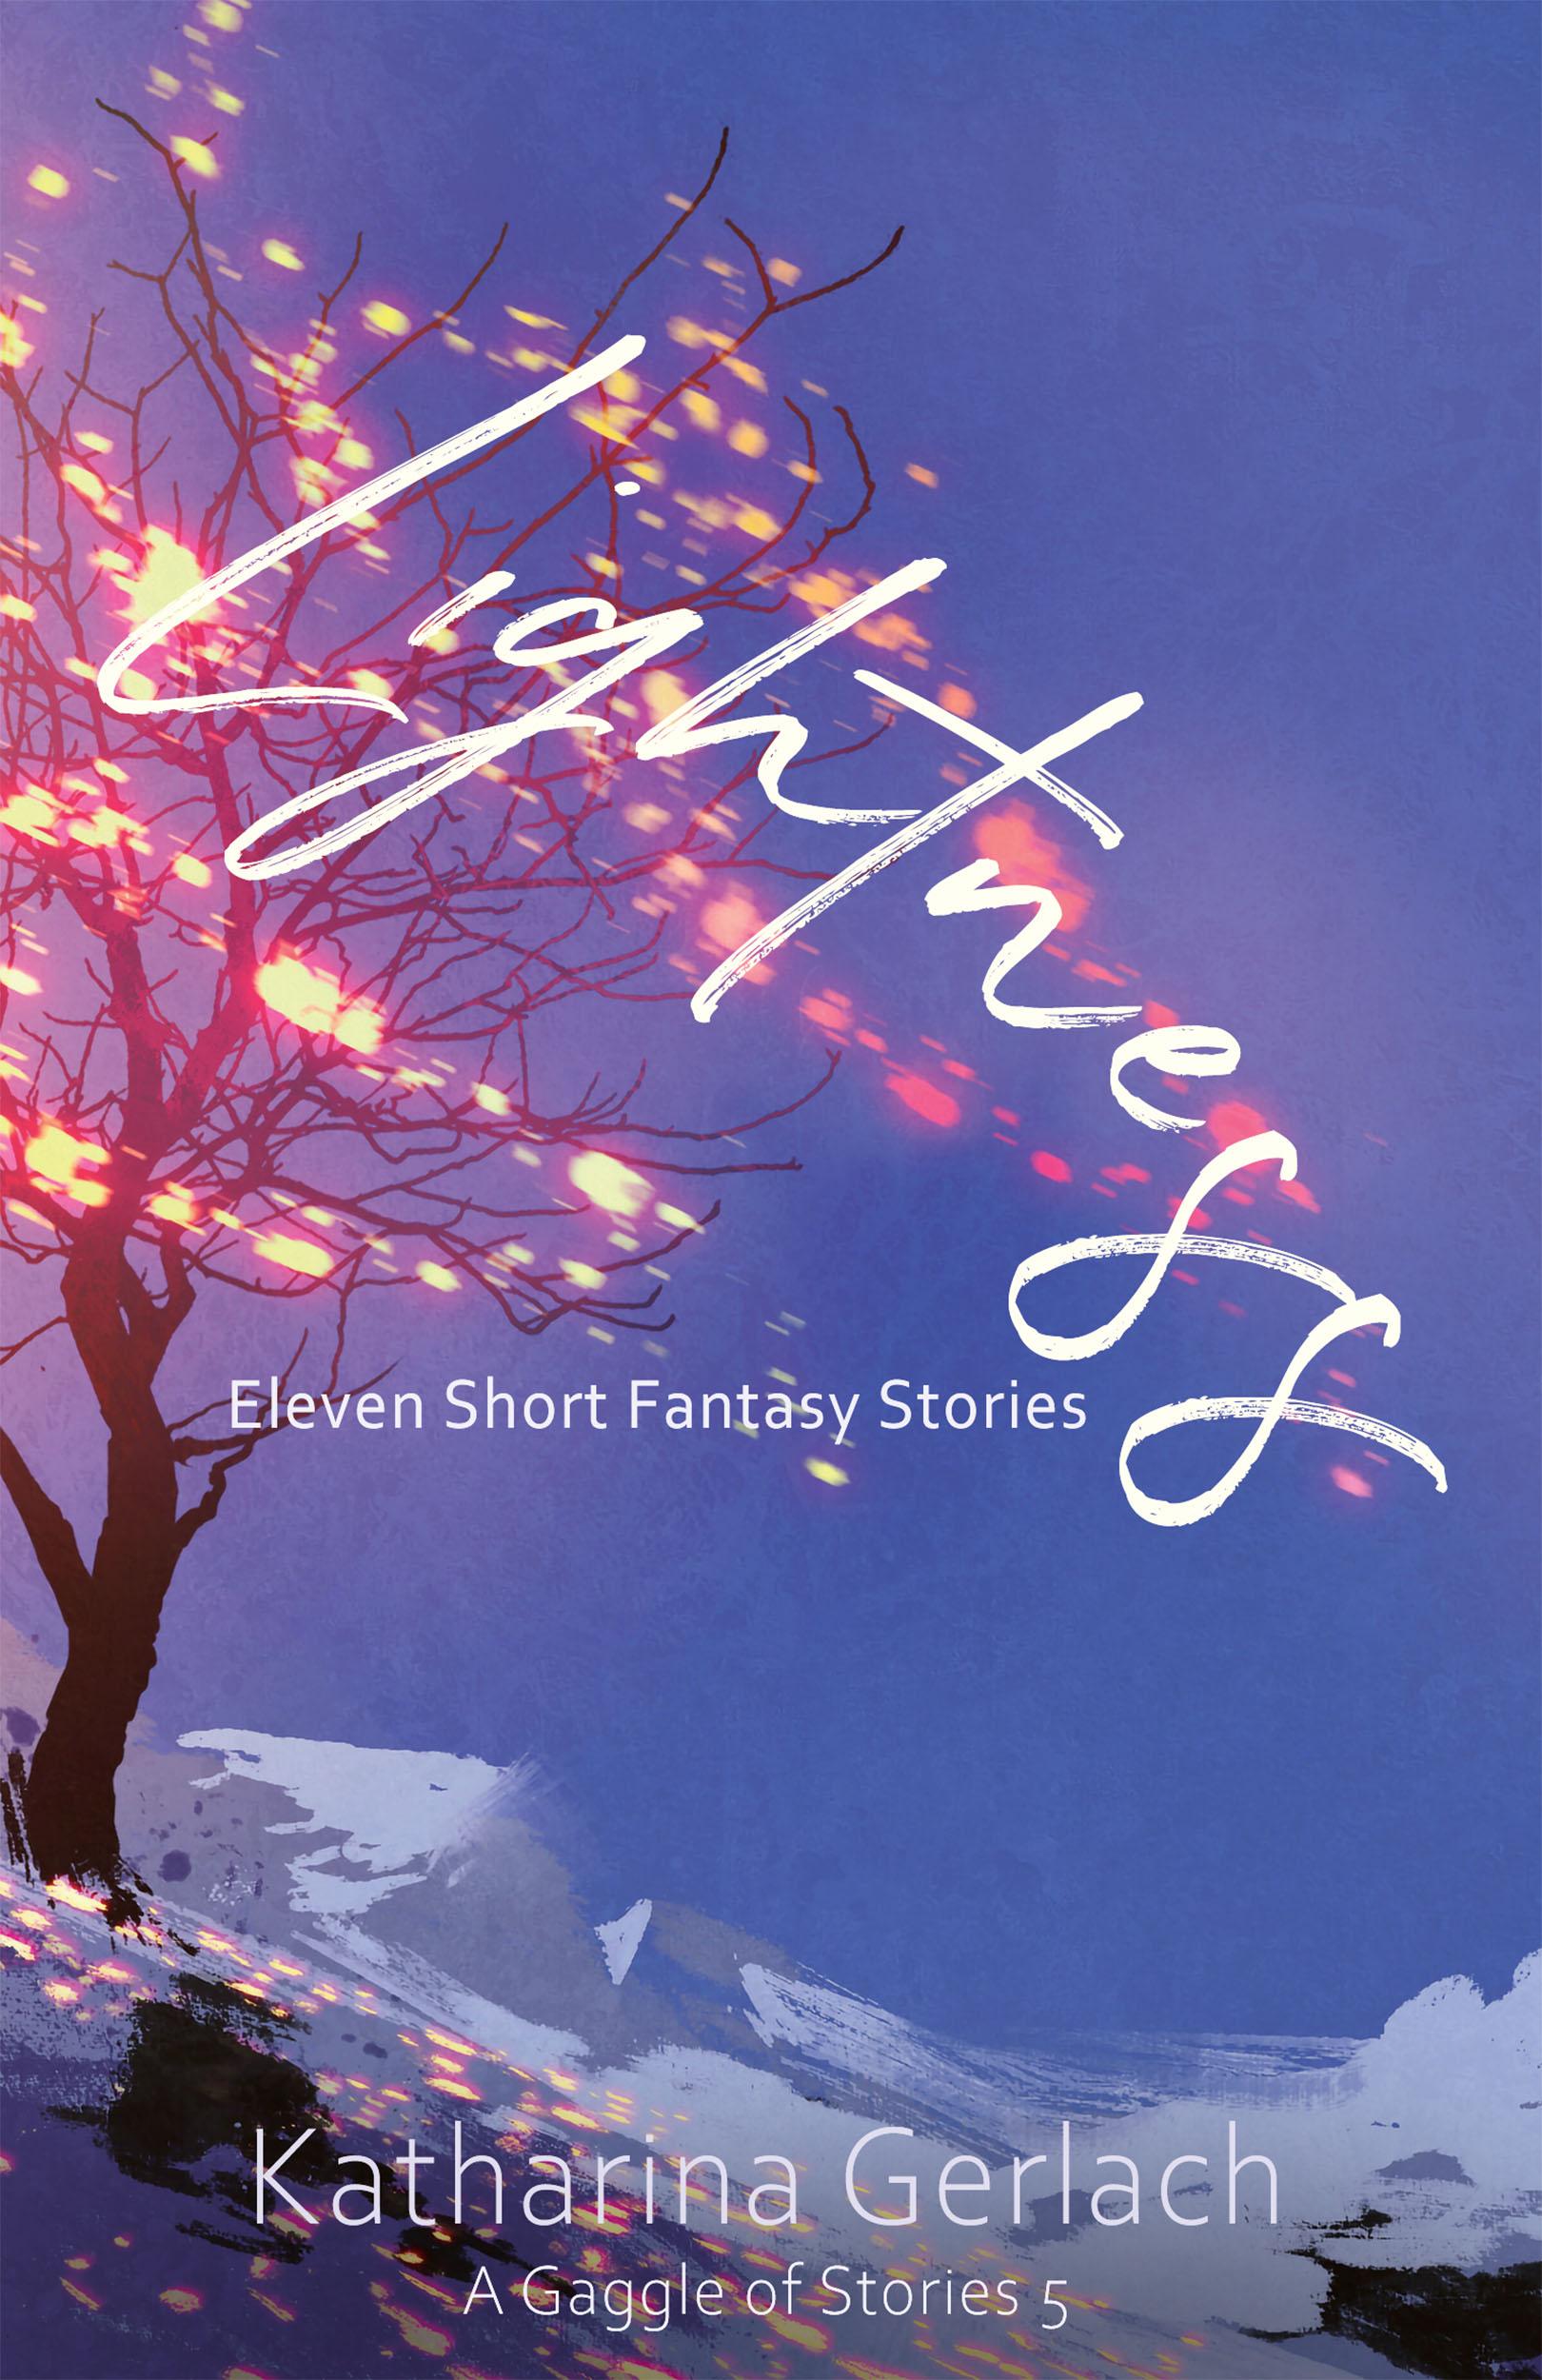 A Gaggle of Stories 5: Lightness